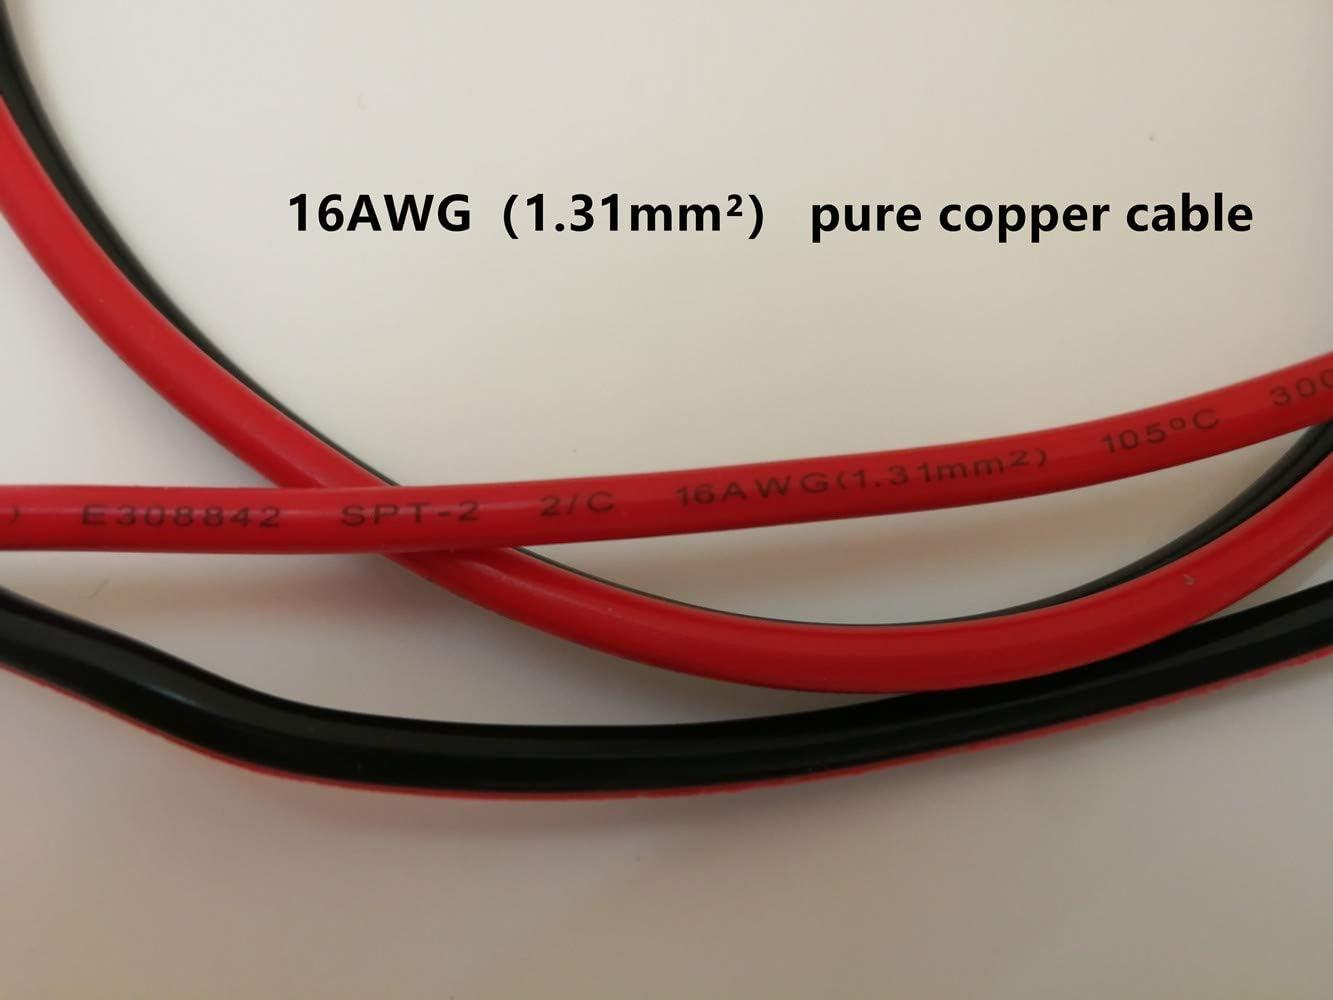 Juego de 2 piezas tractores de coches etc Dongge SAE Conector cargador de bater/ía de motocicleta SAE Cable de carga SAE corta r/ápidamente el enchufe al fusible de 12 V adecuado para cargar motocicletas